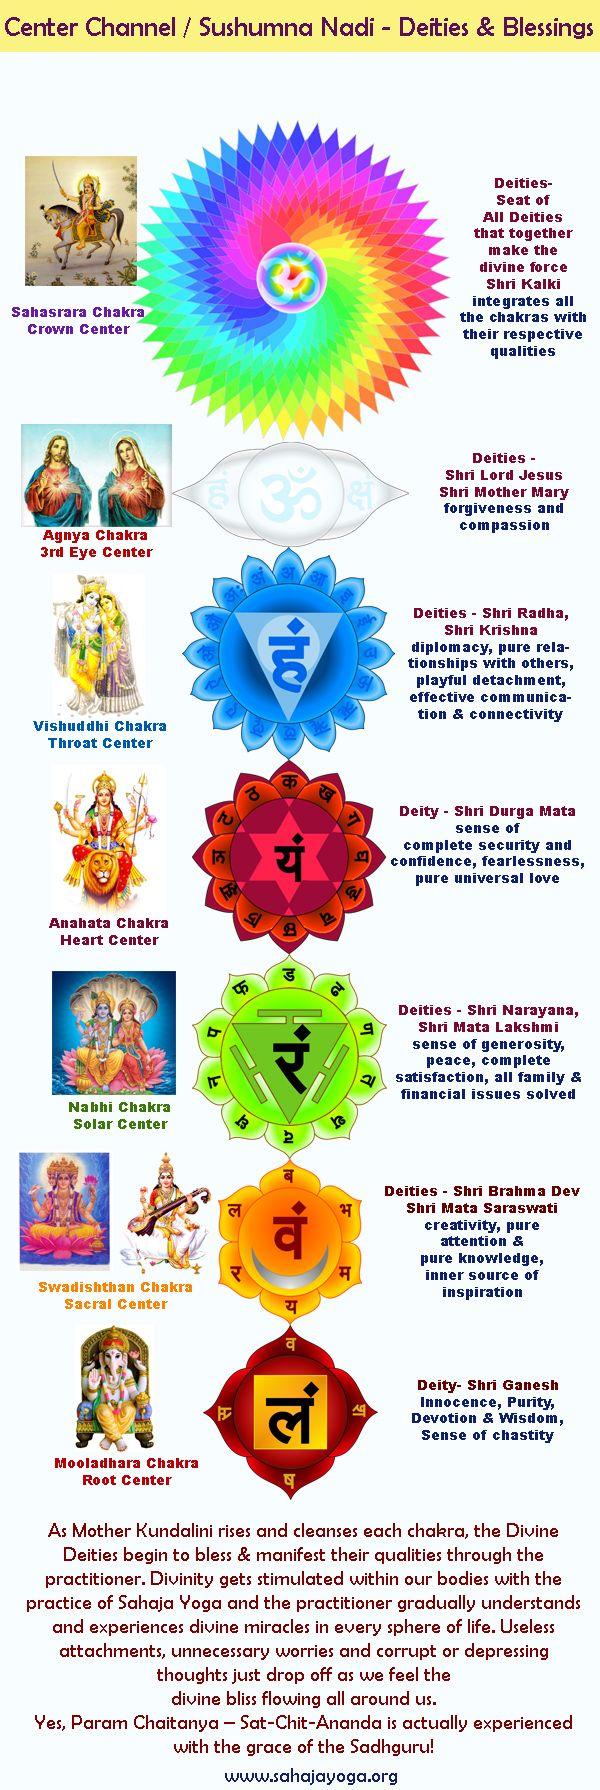 Sushumna Nadi Blessings Deities Aumaparna Jpg 600 1790 Sahaja Yoga Meditation Sahaja Yoga Kundalini